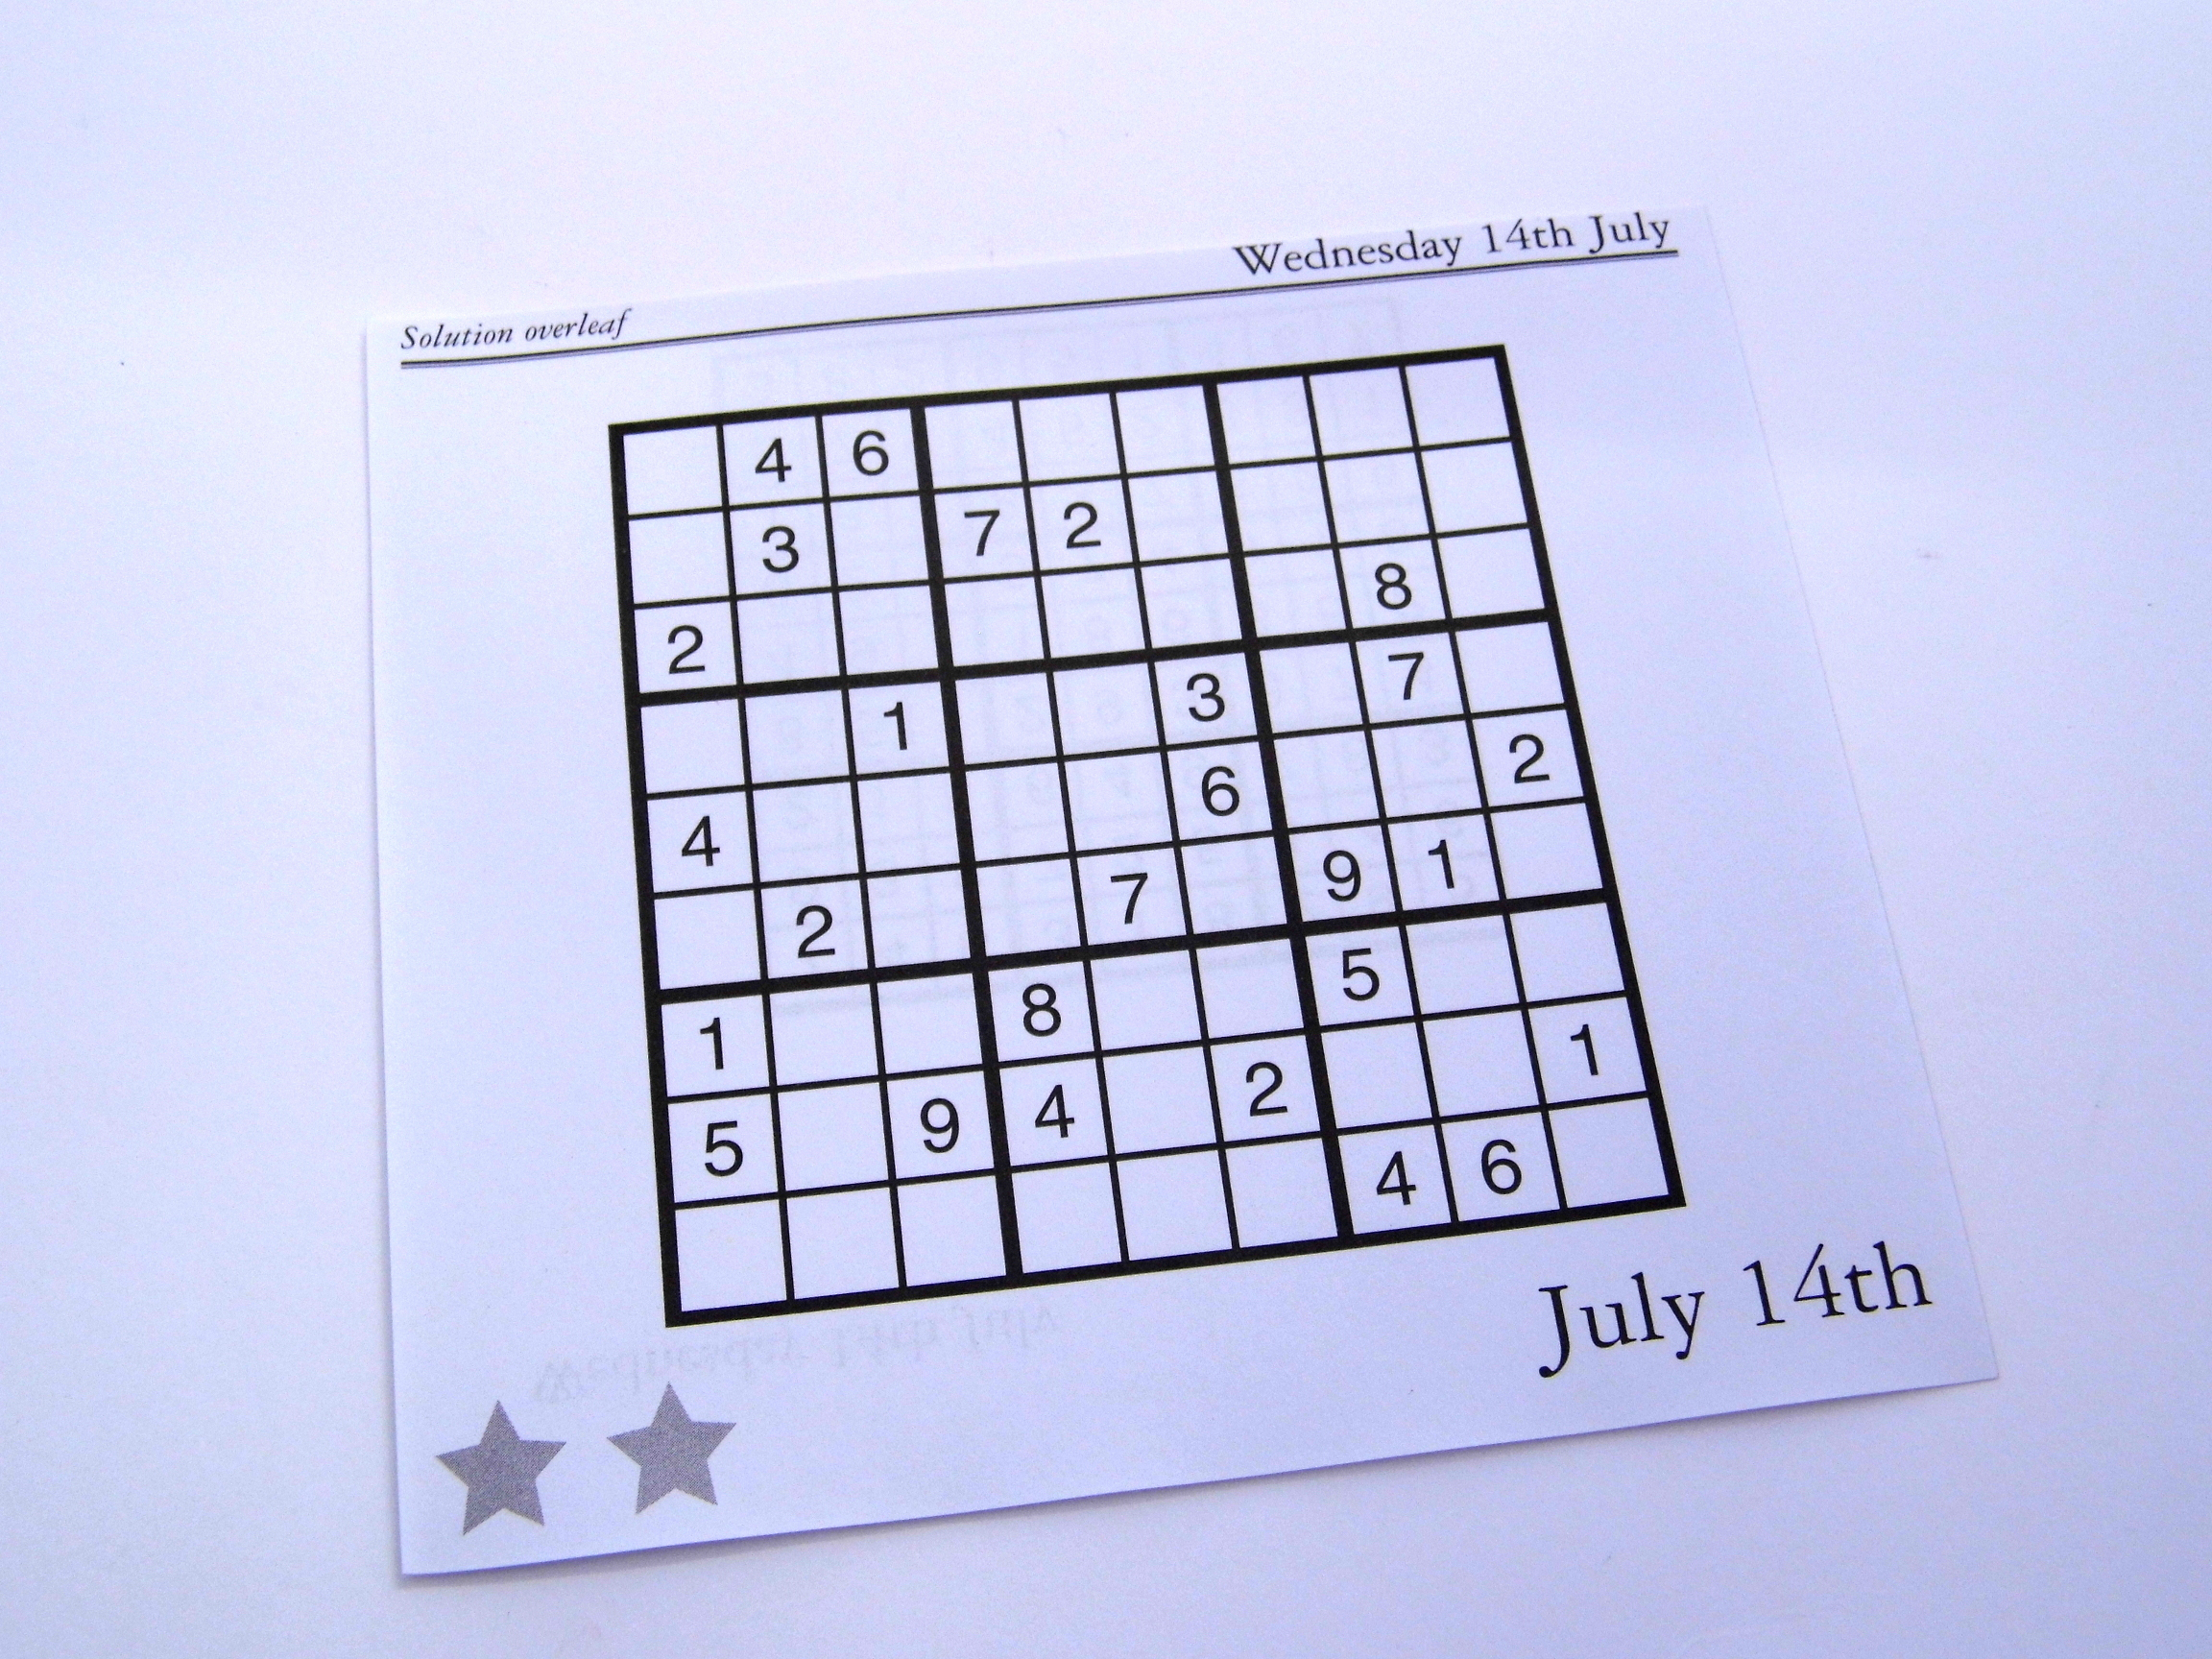 Archive Evil Puzzles – Free Sudoku Puzzles - Free Printable Sudoku 6 - Printable Sudoku Puzzles 6 Per Page